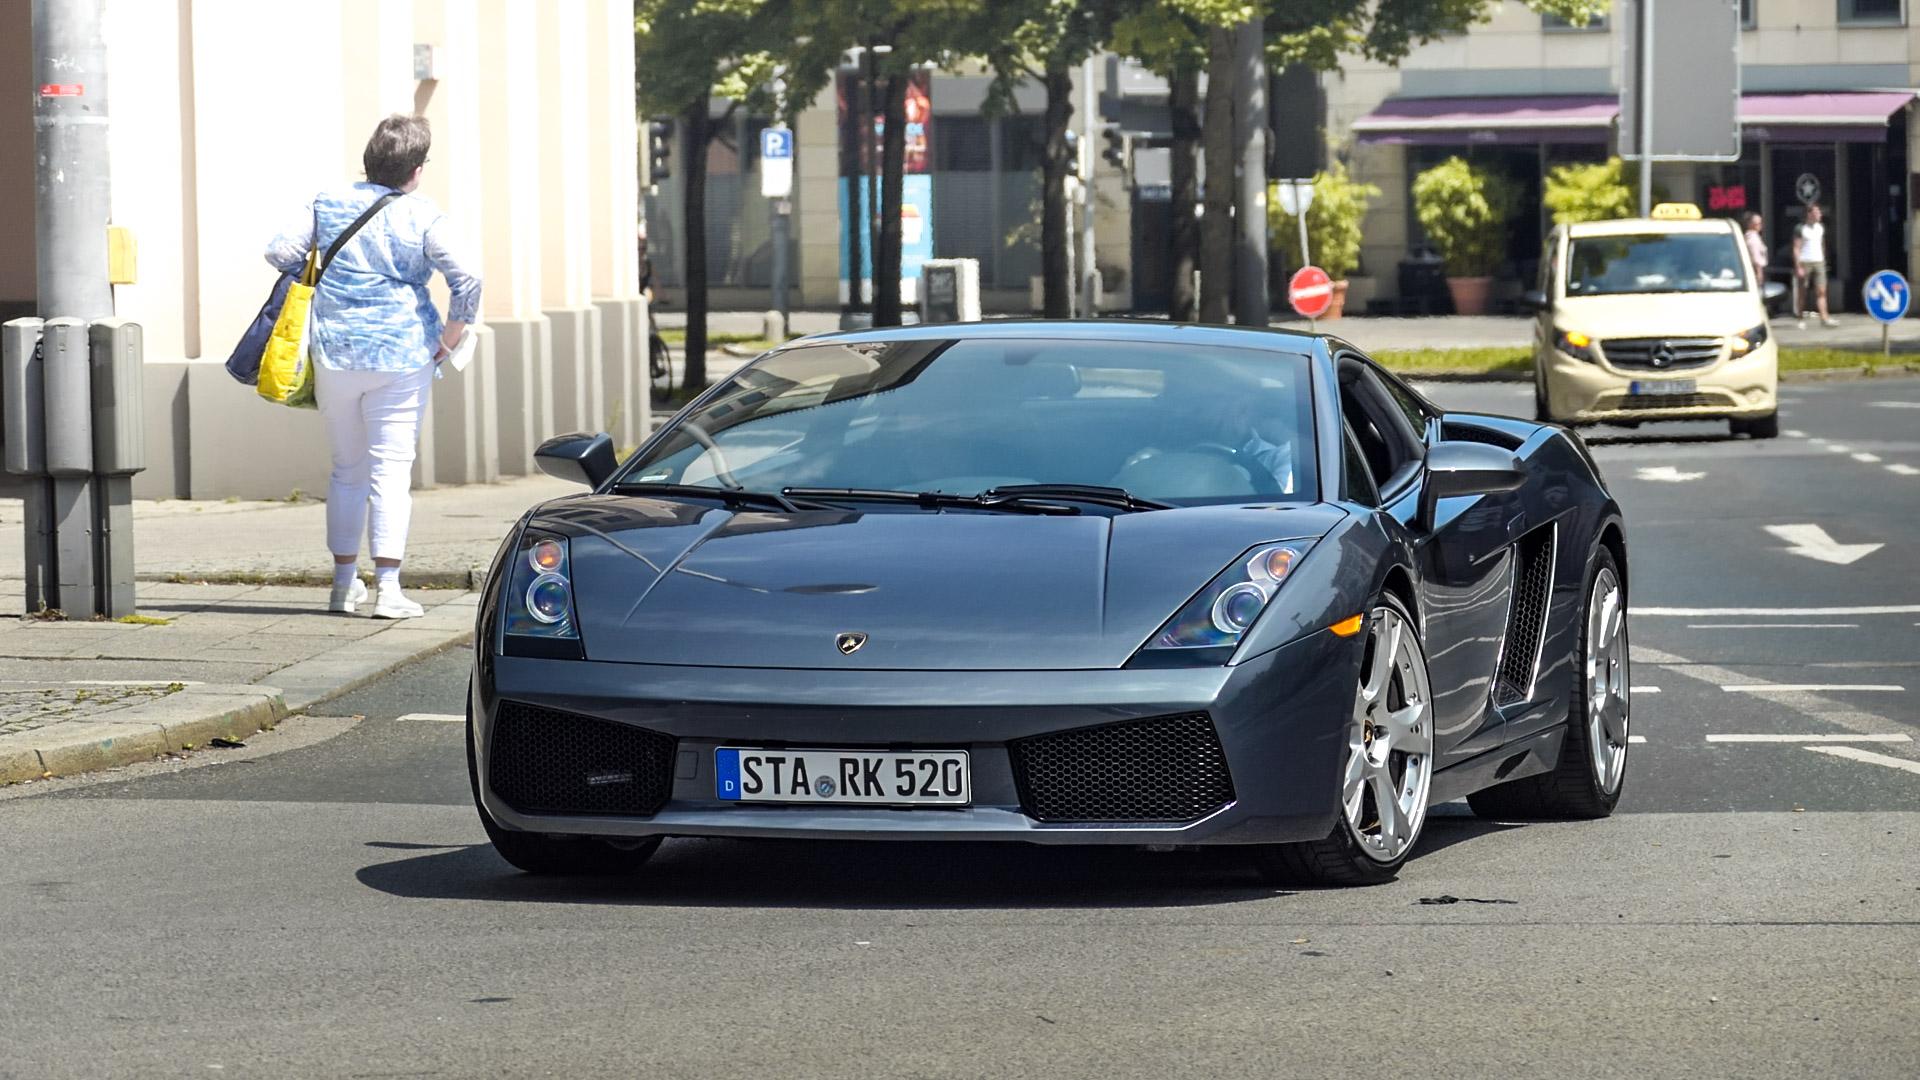 Lamborghini Gallardo - STA-RK-520